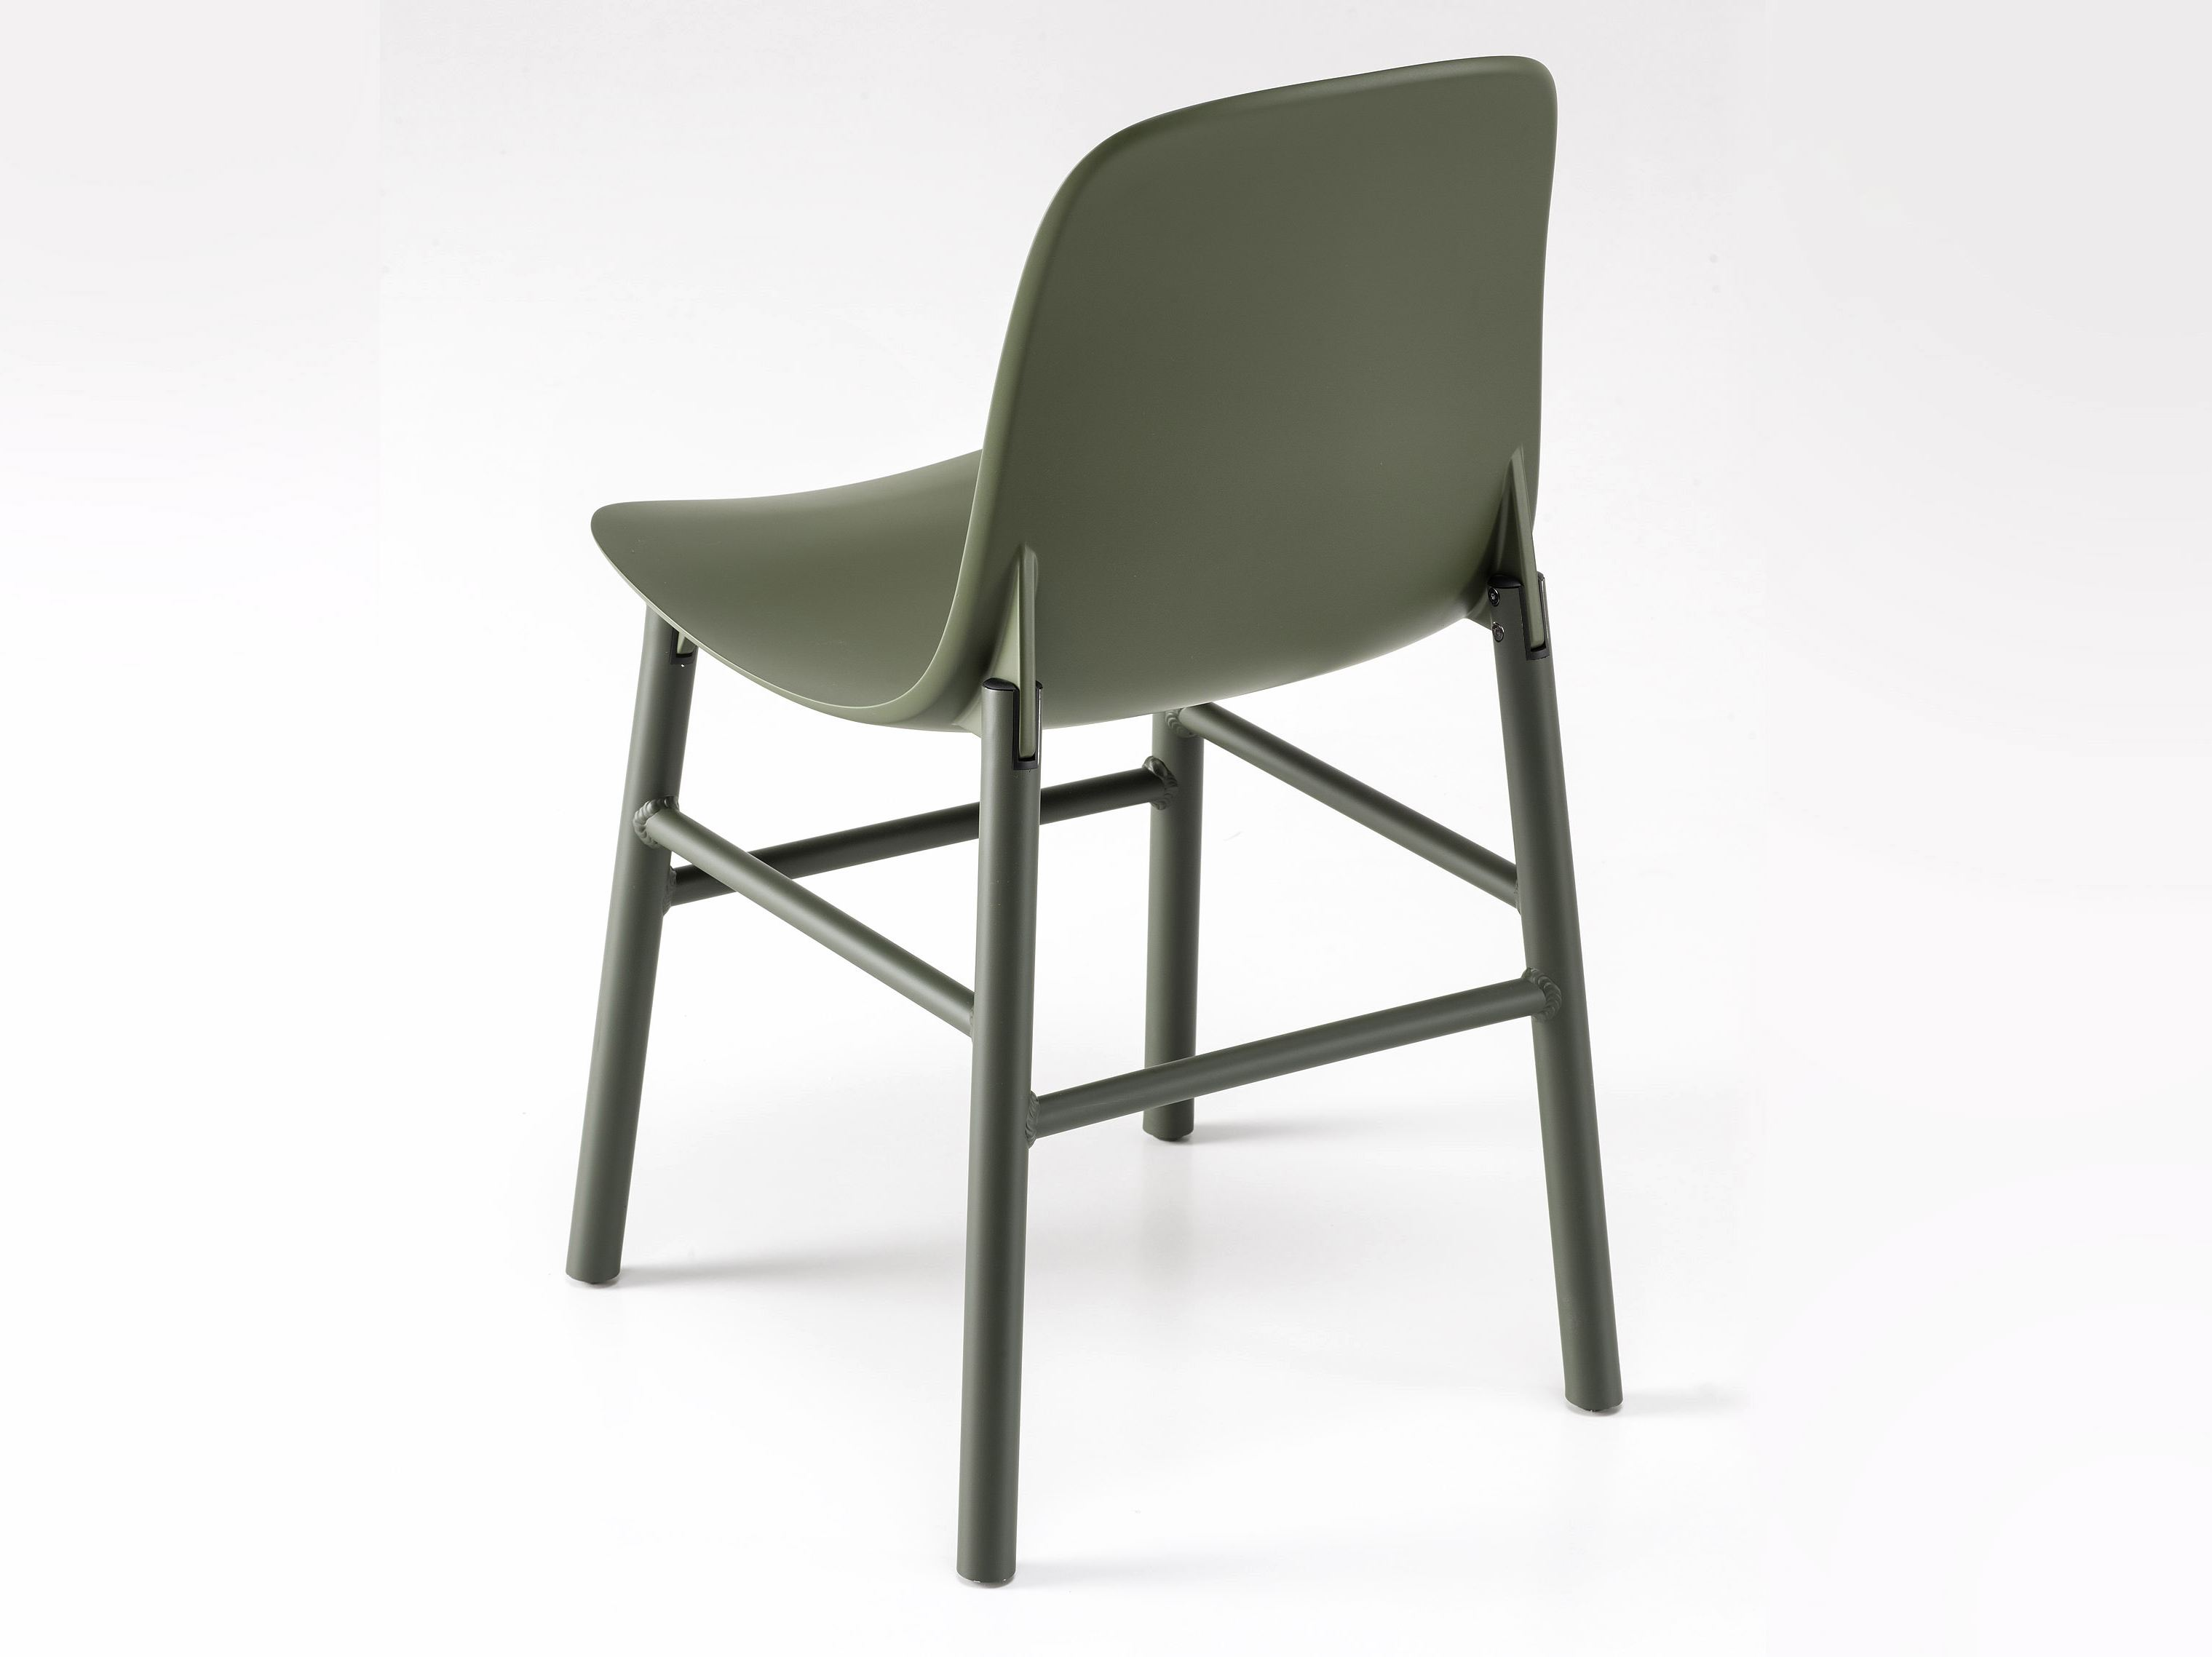 Chair BOUNCE By Gufram design Karim Rashid